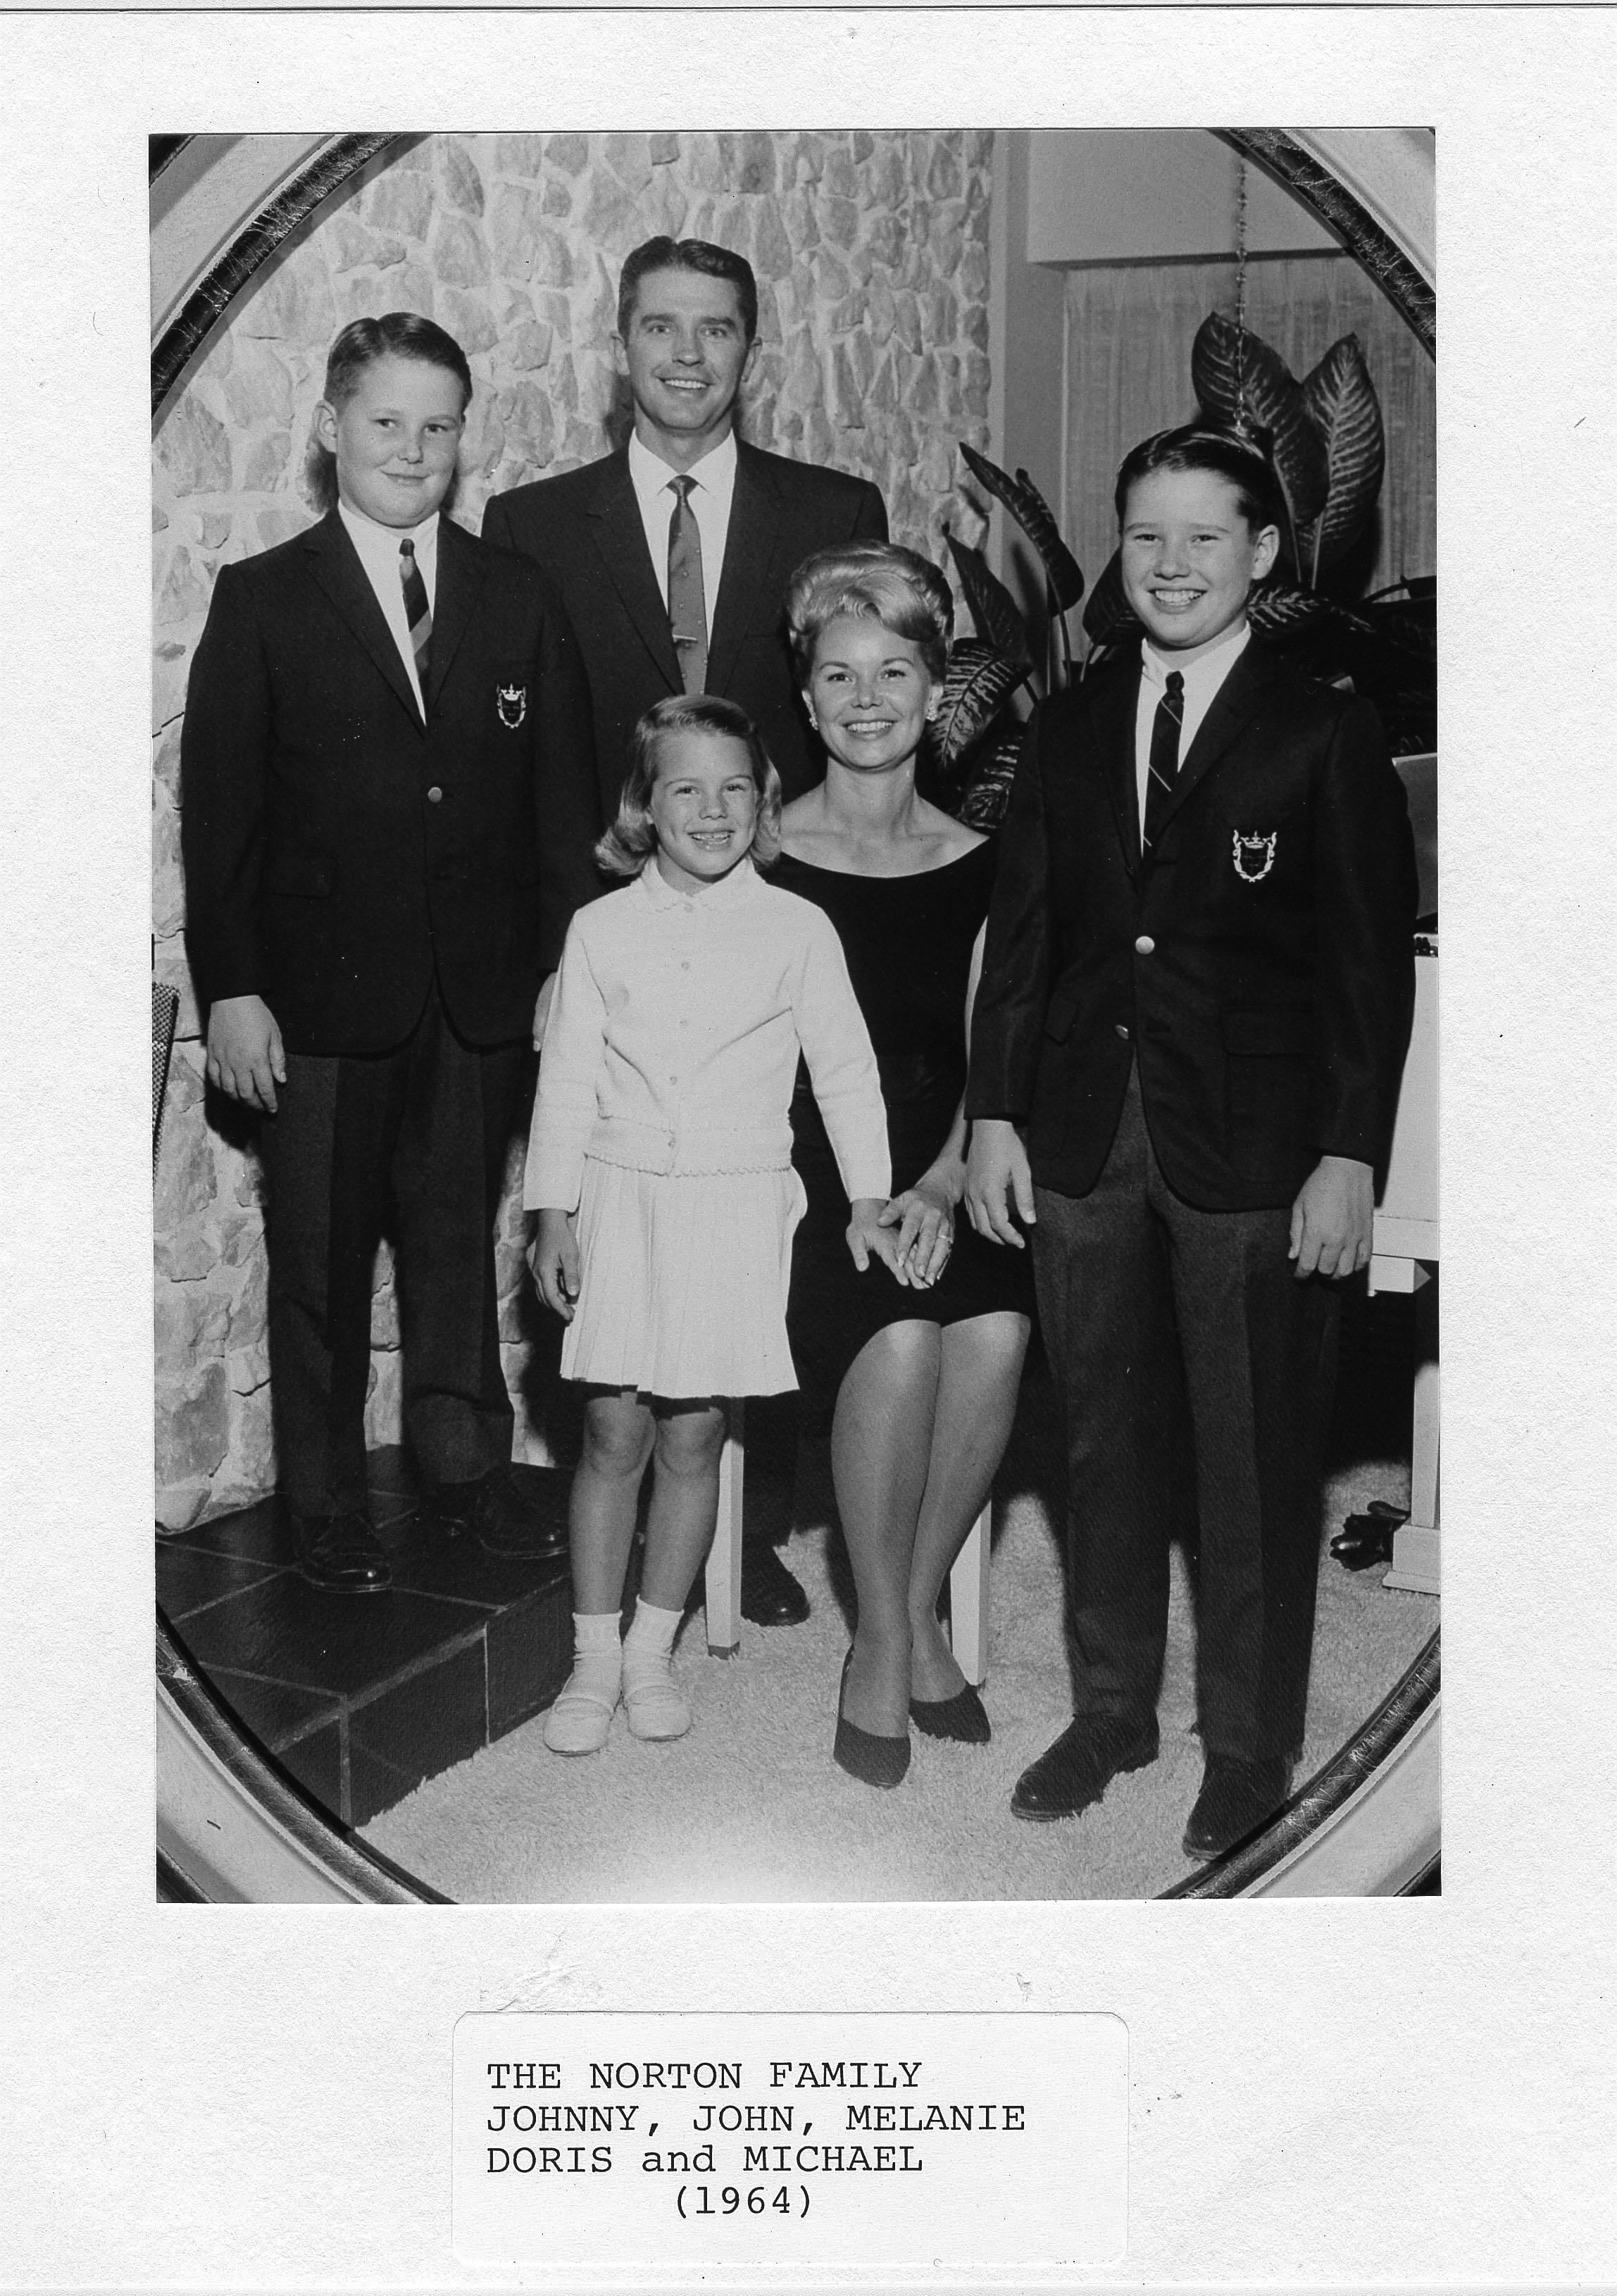 historic photo of the Norton family